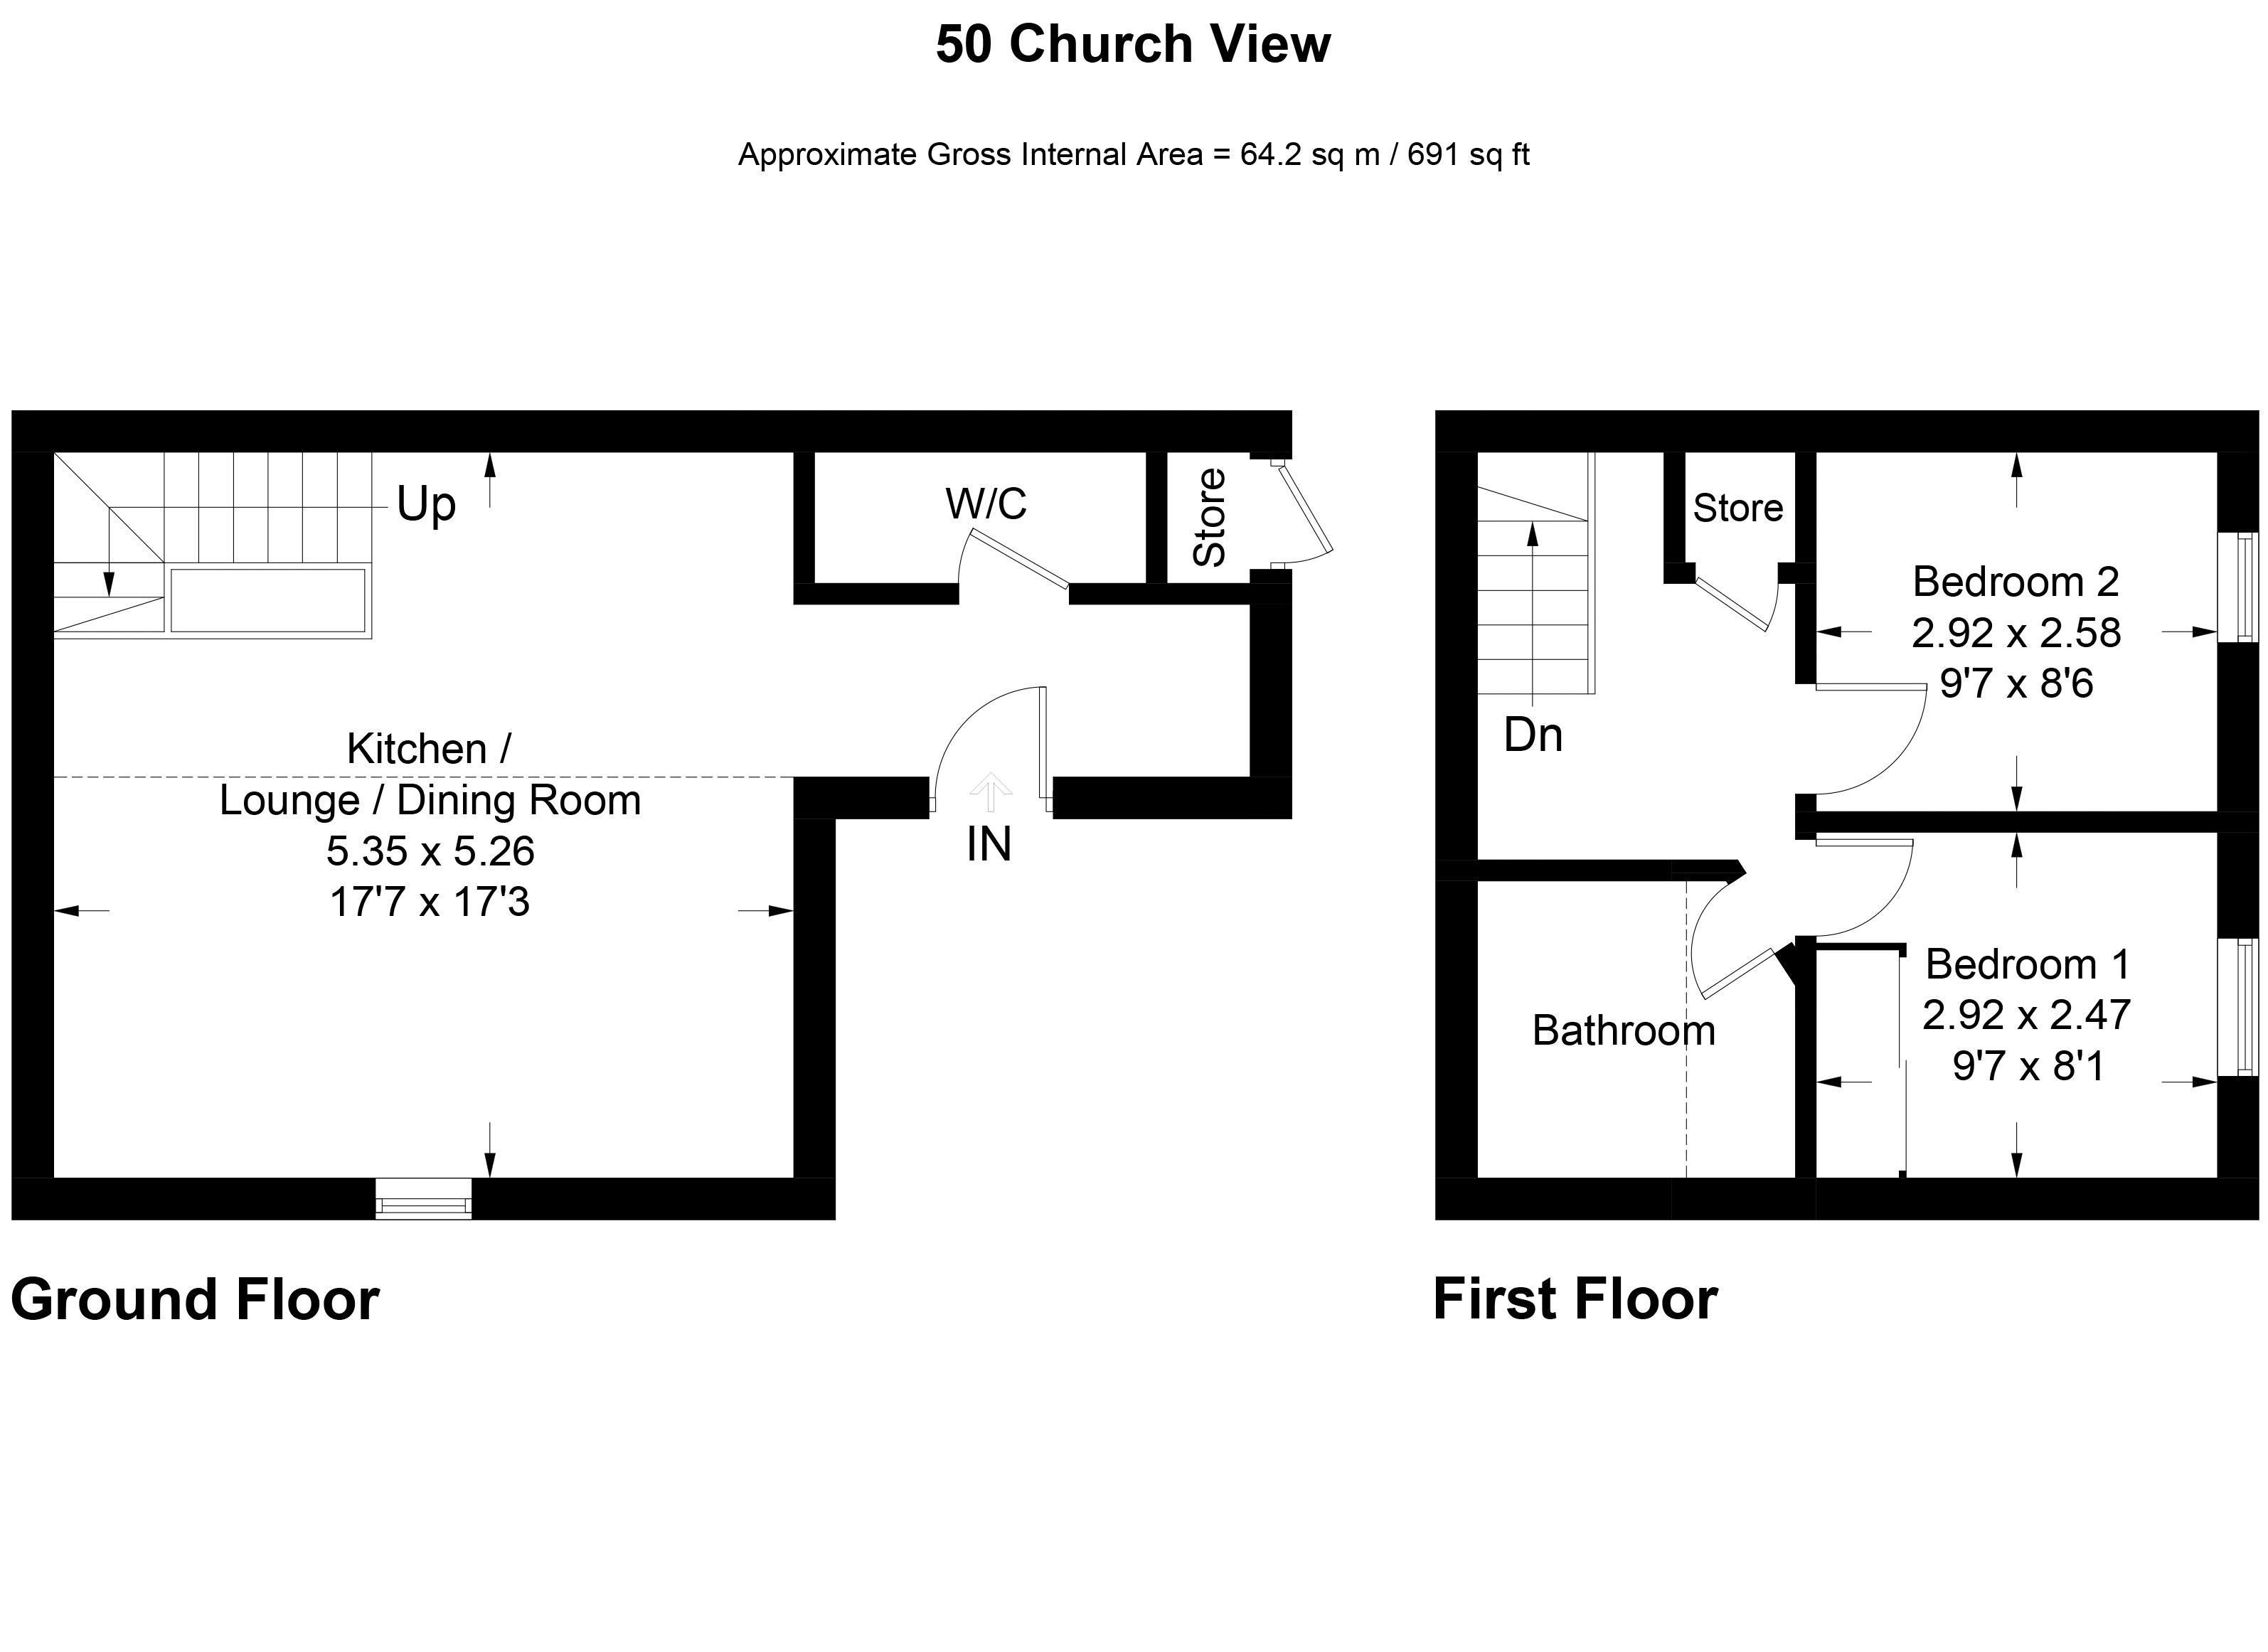 Church View Winchburgh